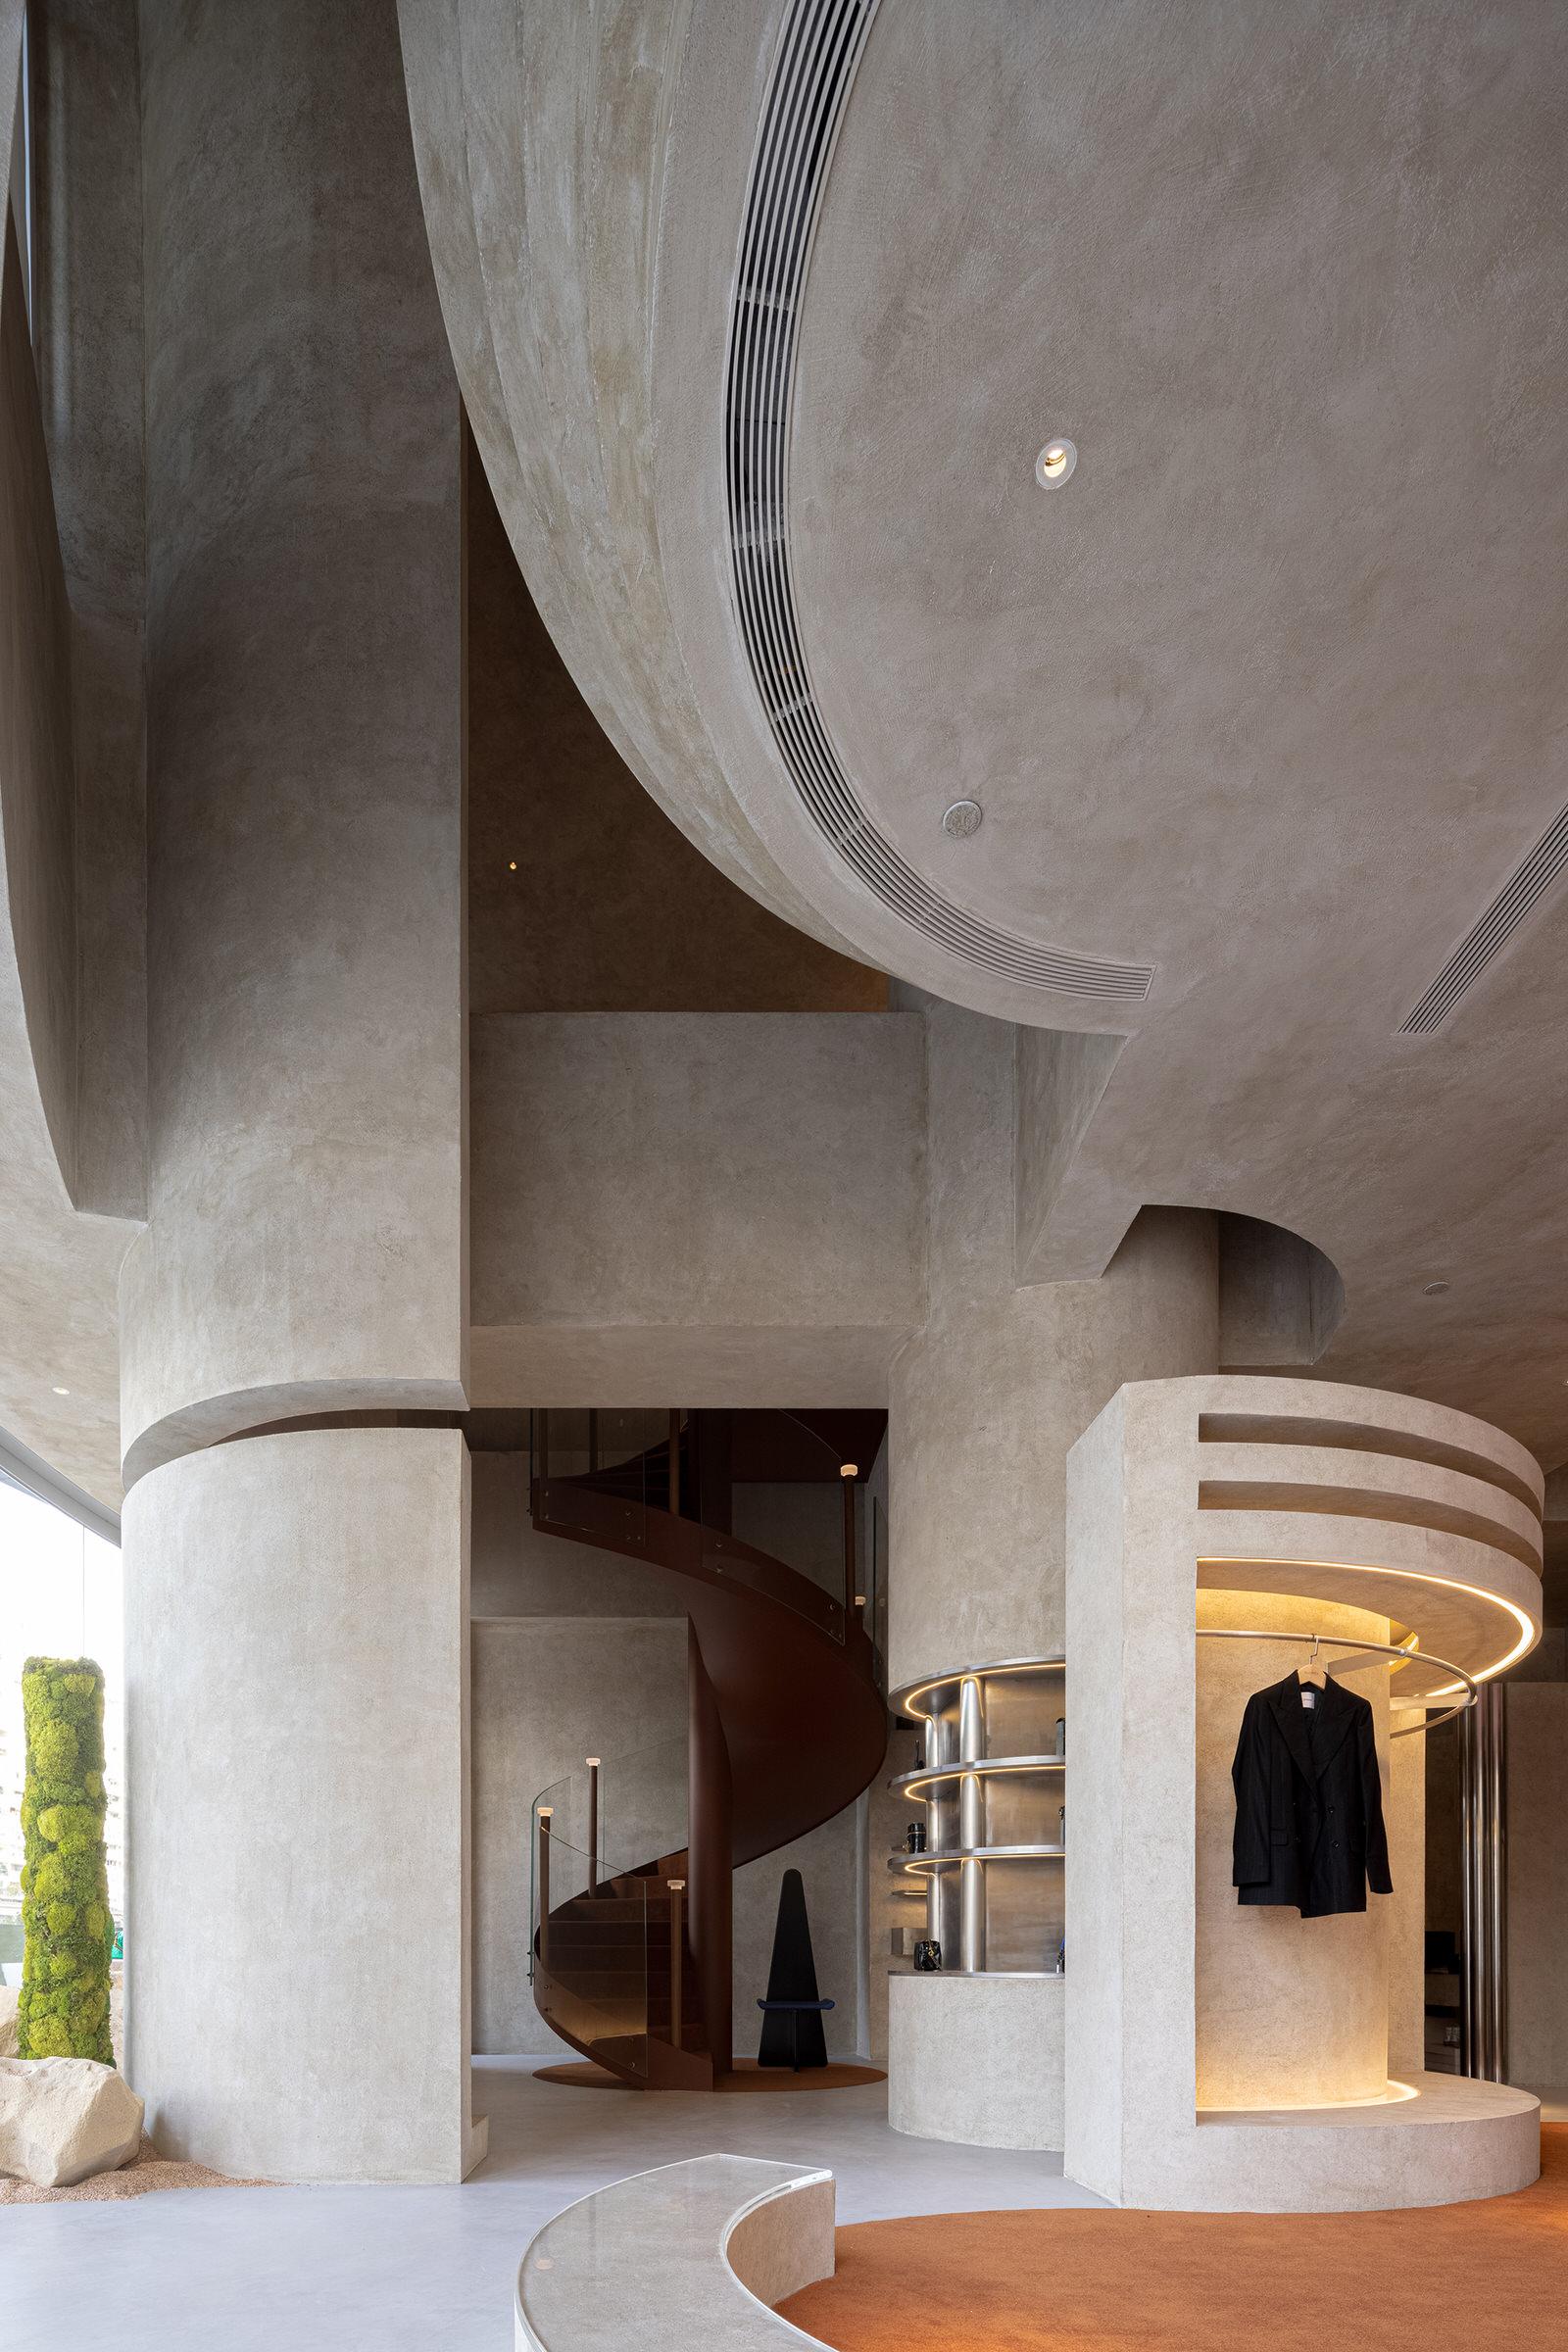 Liang Architecture Studio Audrey Boutique Hangzhou China Luxury Retail Photo Shao Feng Yellowtrace 02